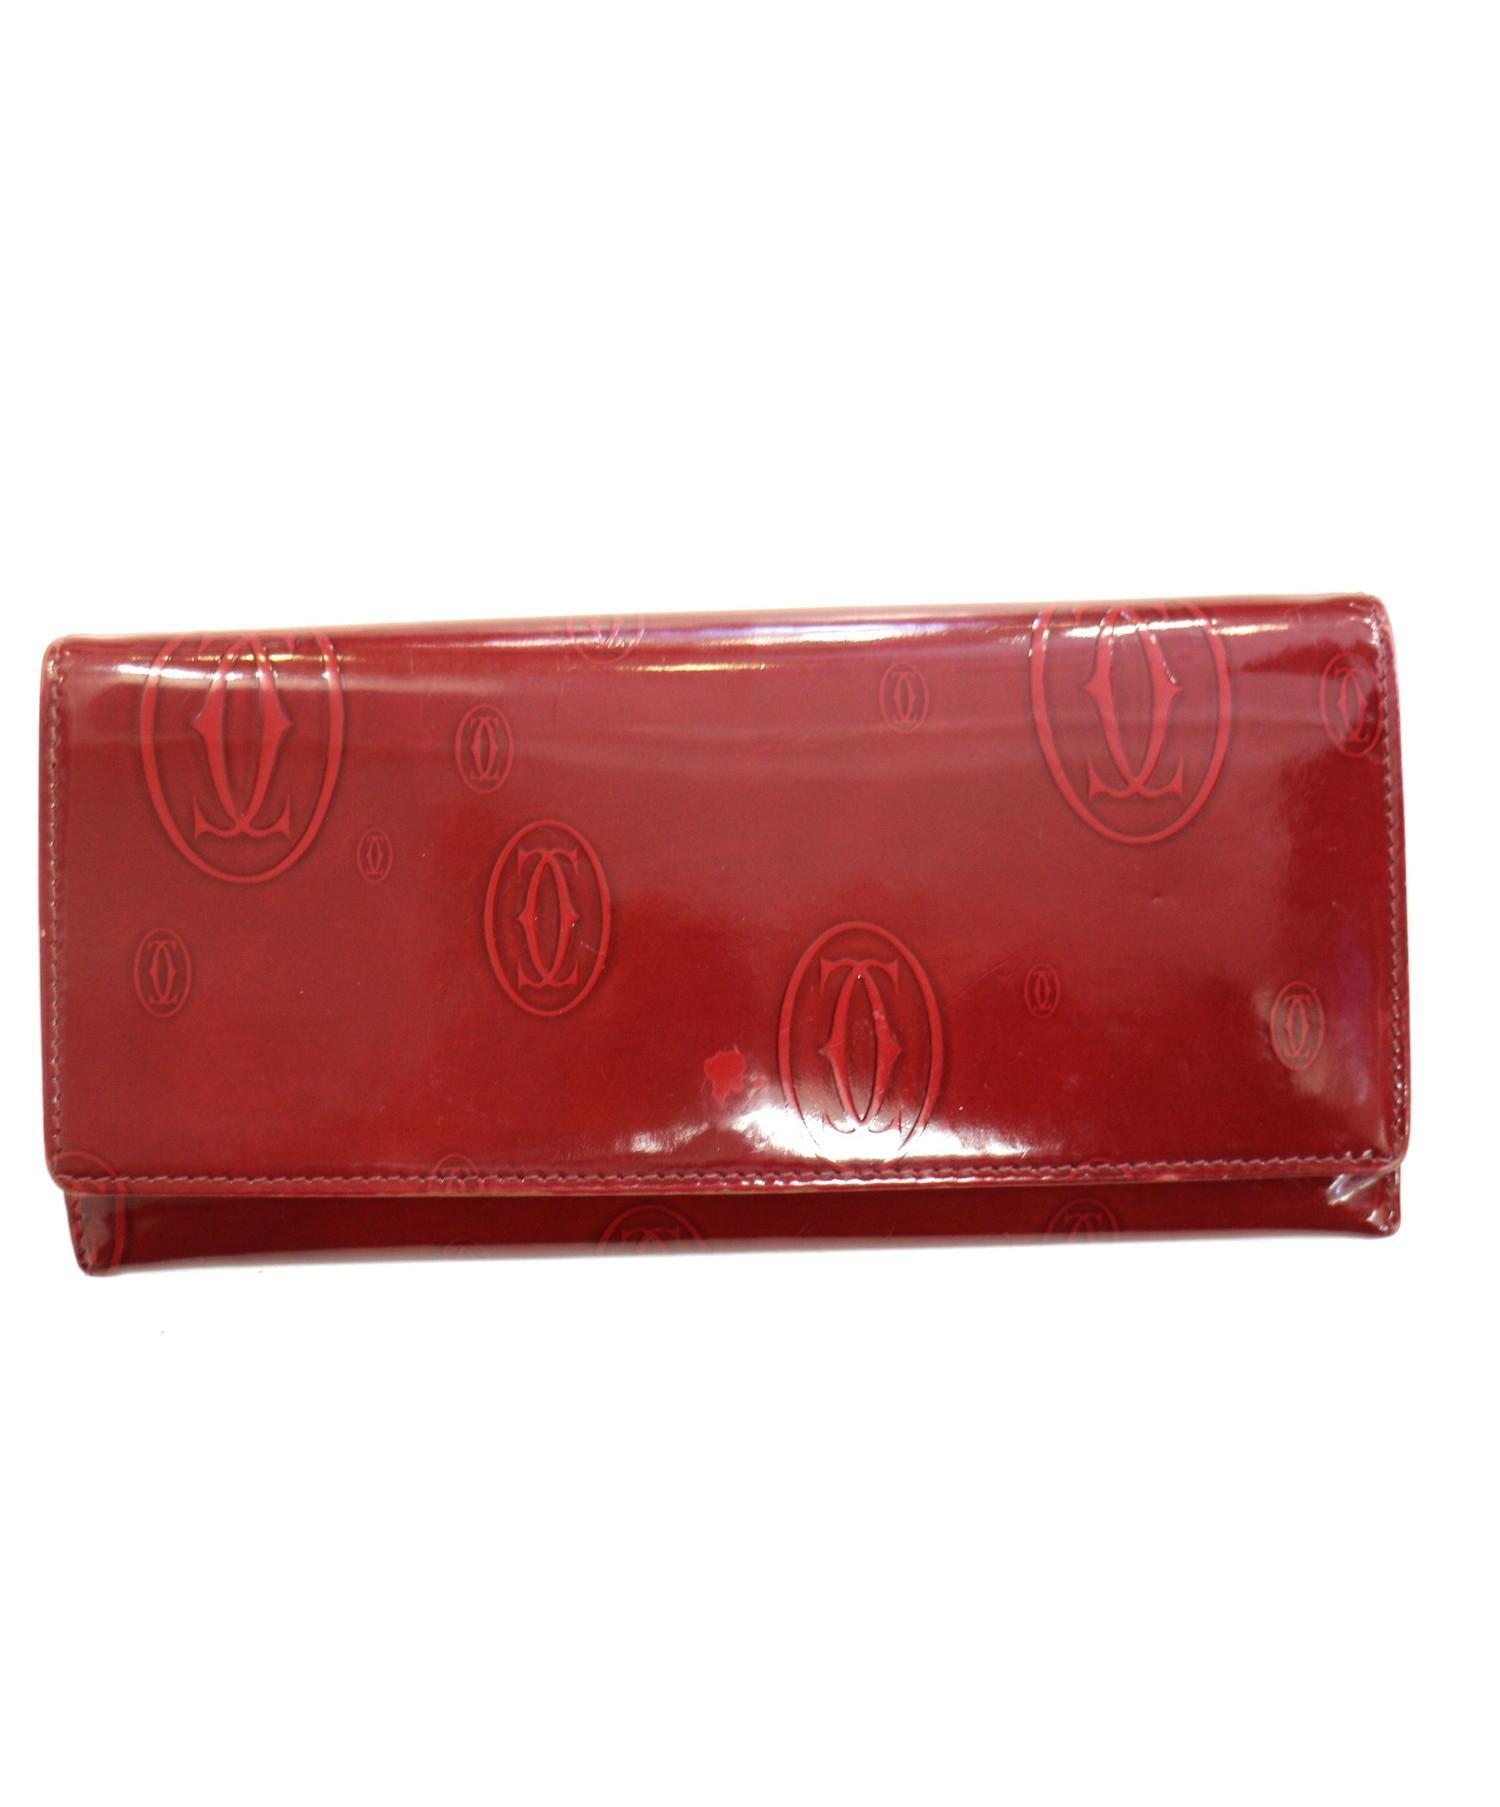 4a4adbd2ecb1 中古・古着通販】Cartier (カルティエ) 長財布 ボルドー サイズ:下記参照 ...